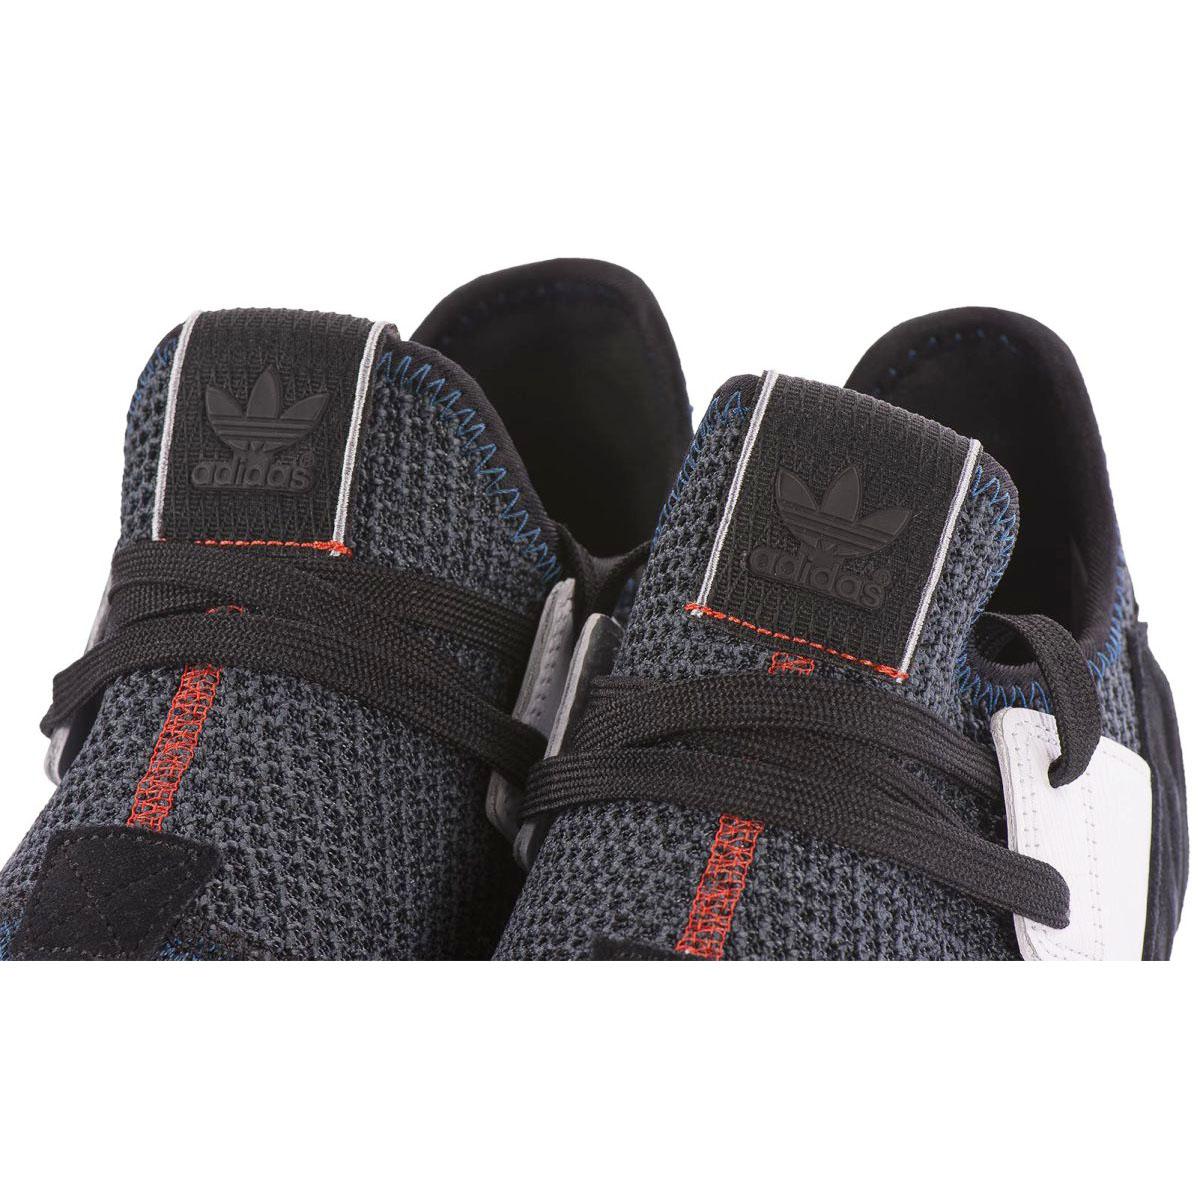 NEU adidas Originals ZX AQ5398 Flux Plus Schuhe Blau-Schwarz AQ5398 ZX SALE dc946f